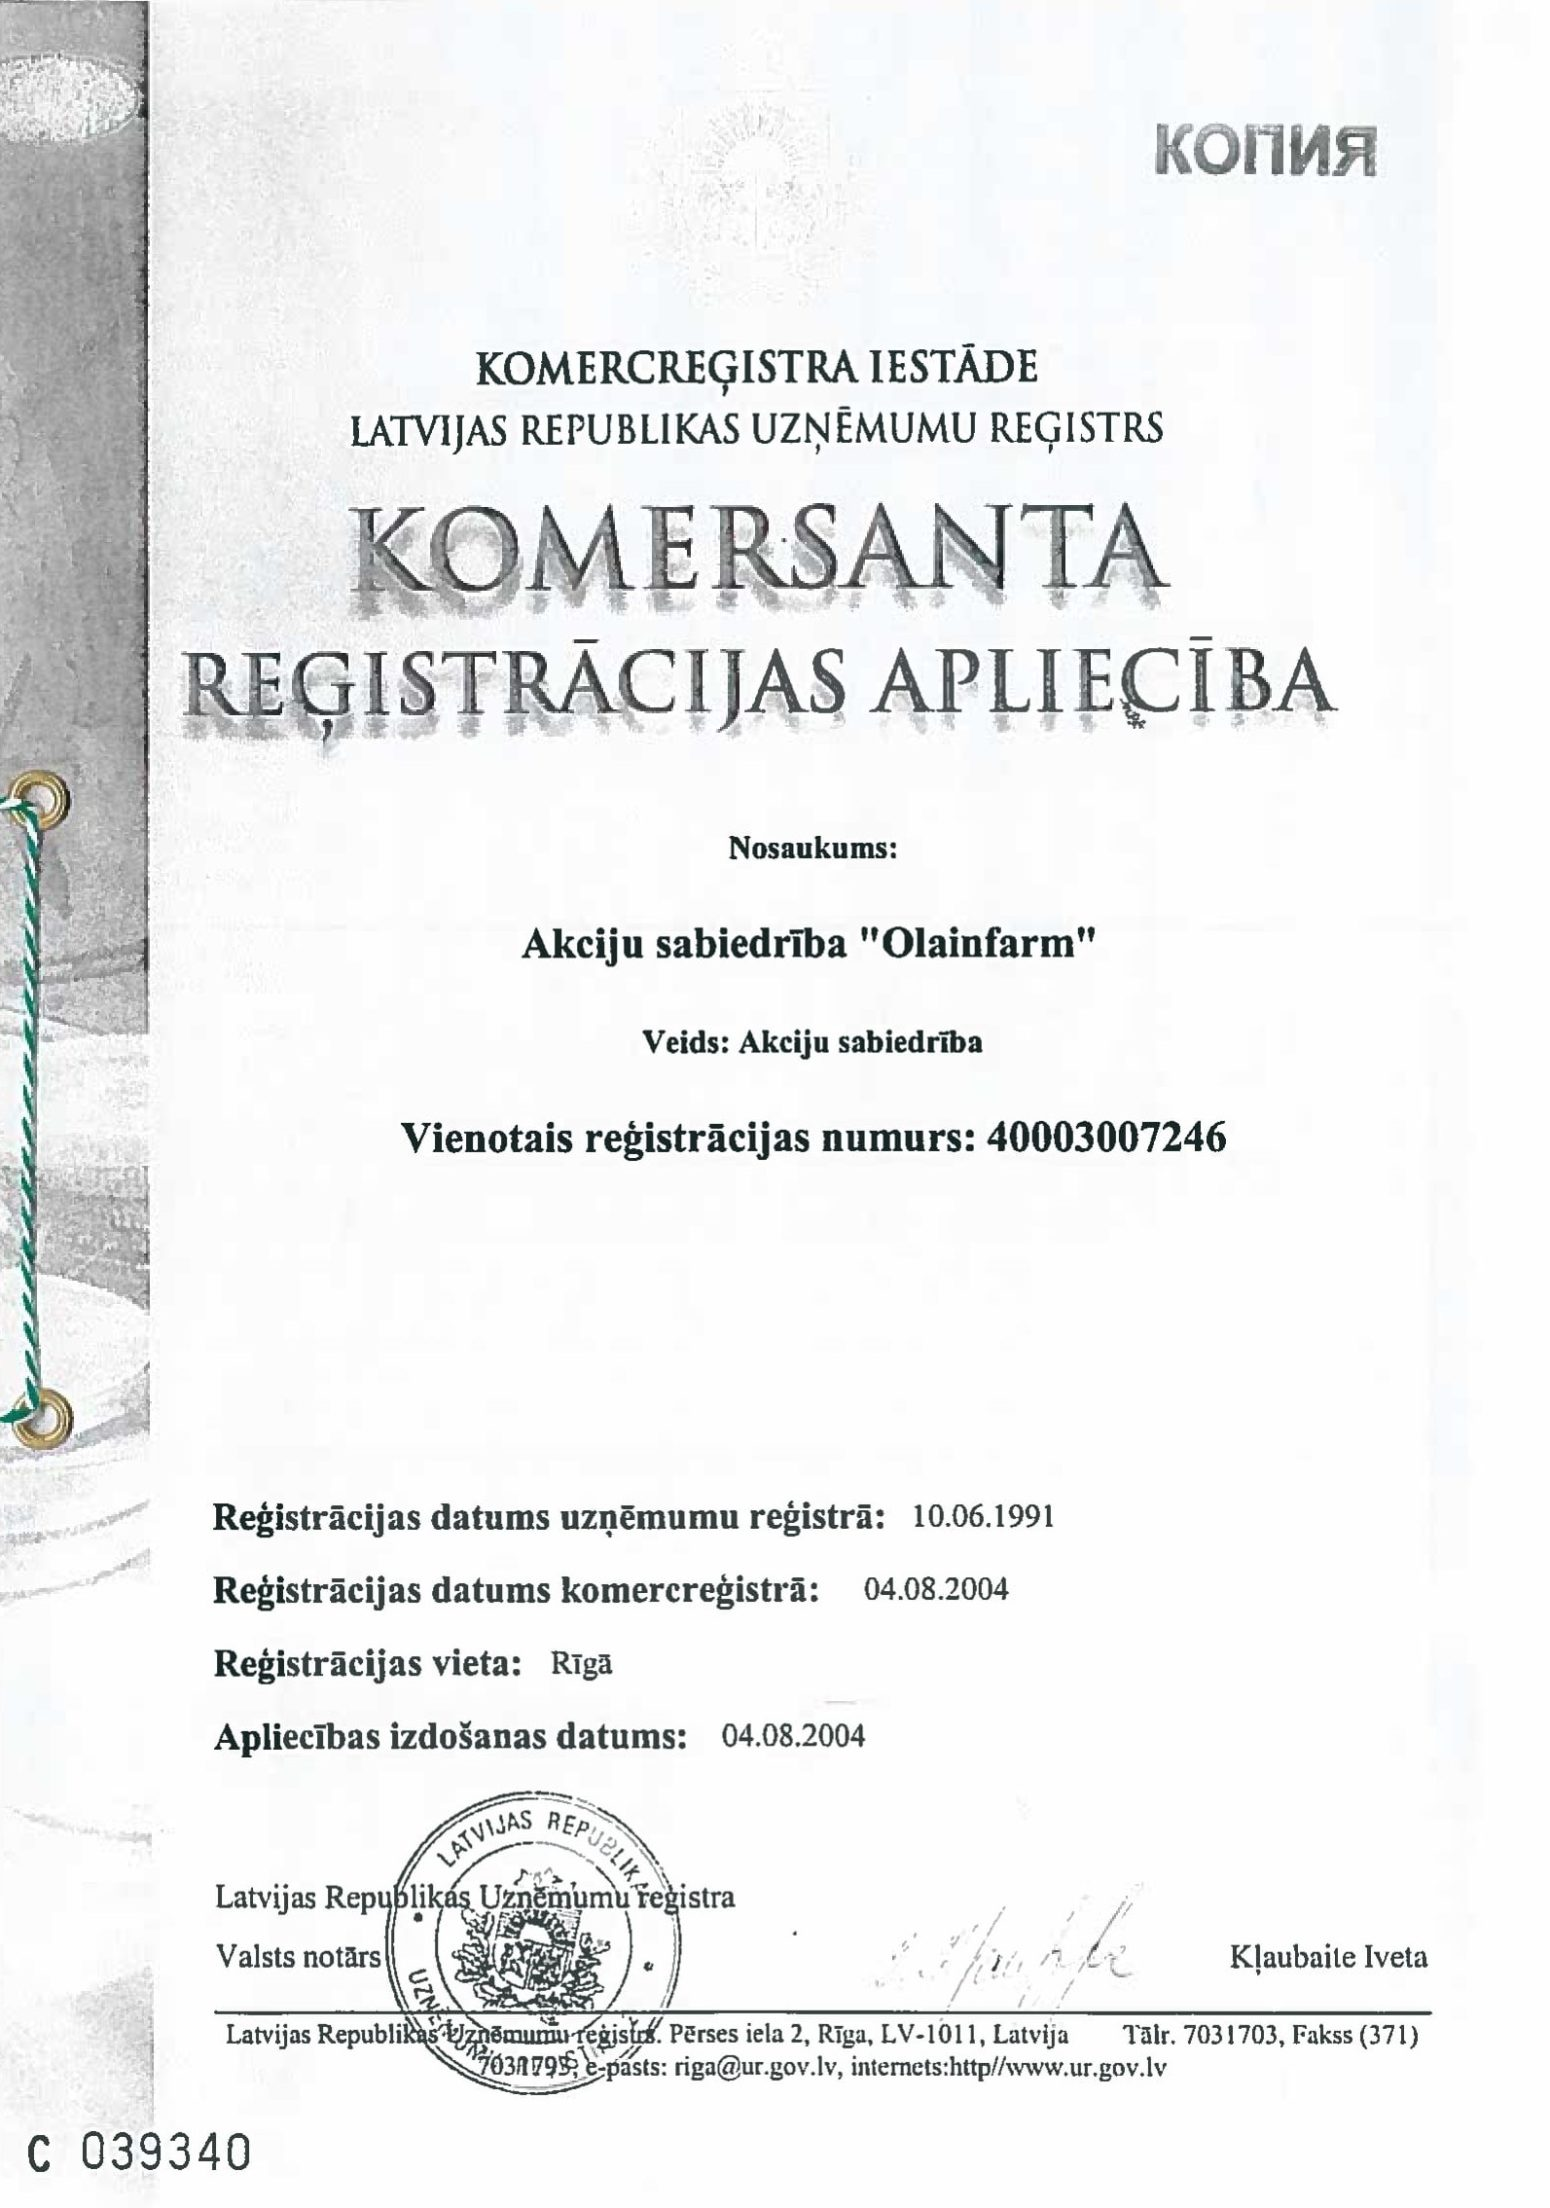 Registracionnoe-udostoverenie-Olaynfarm-1